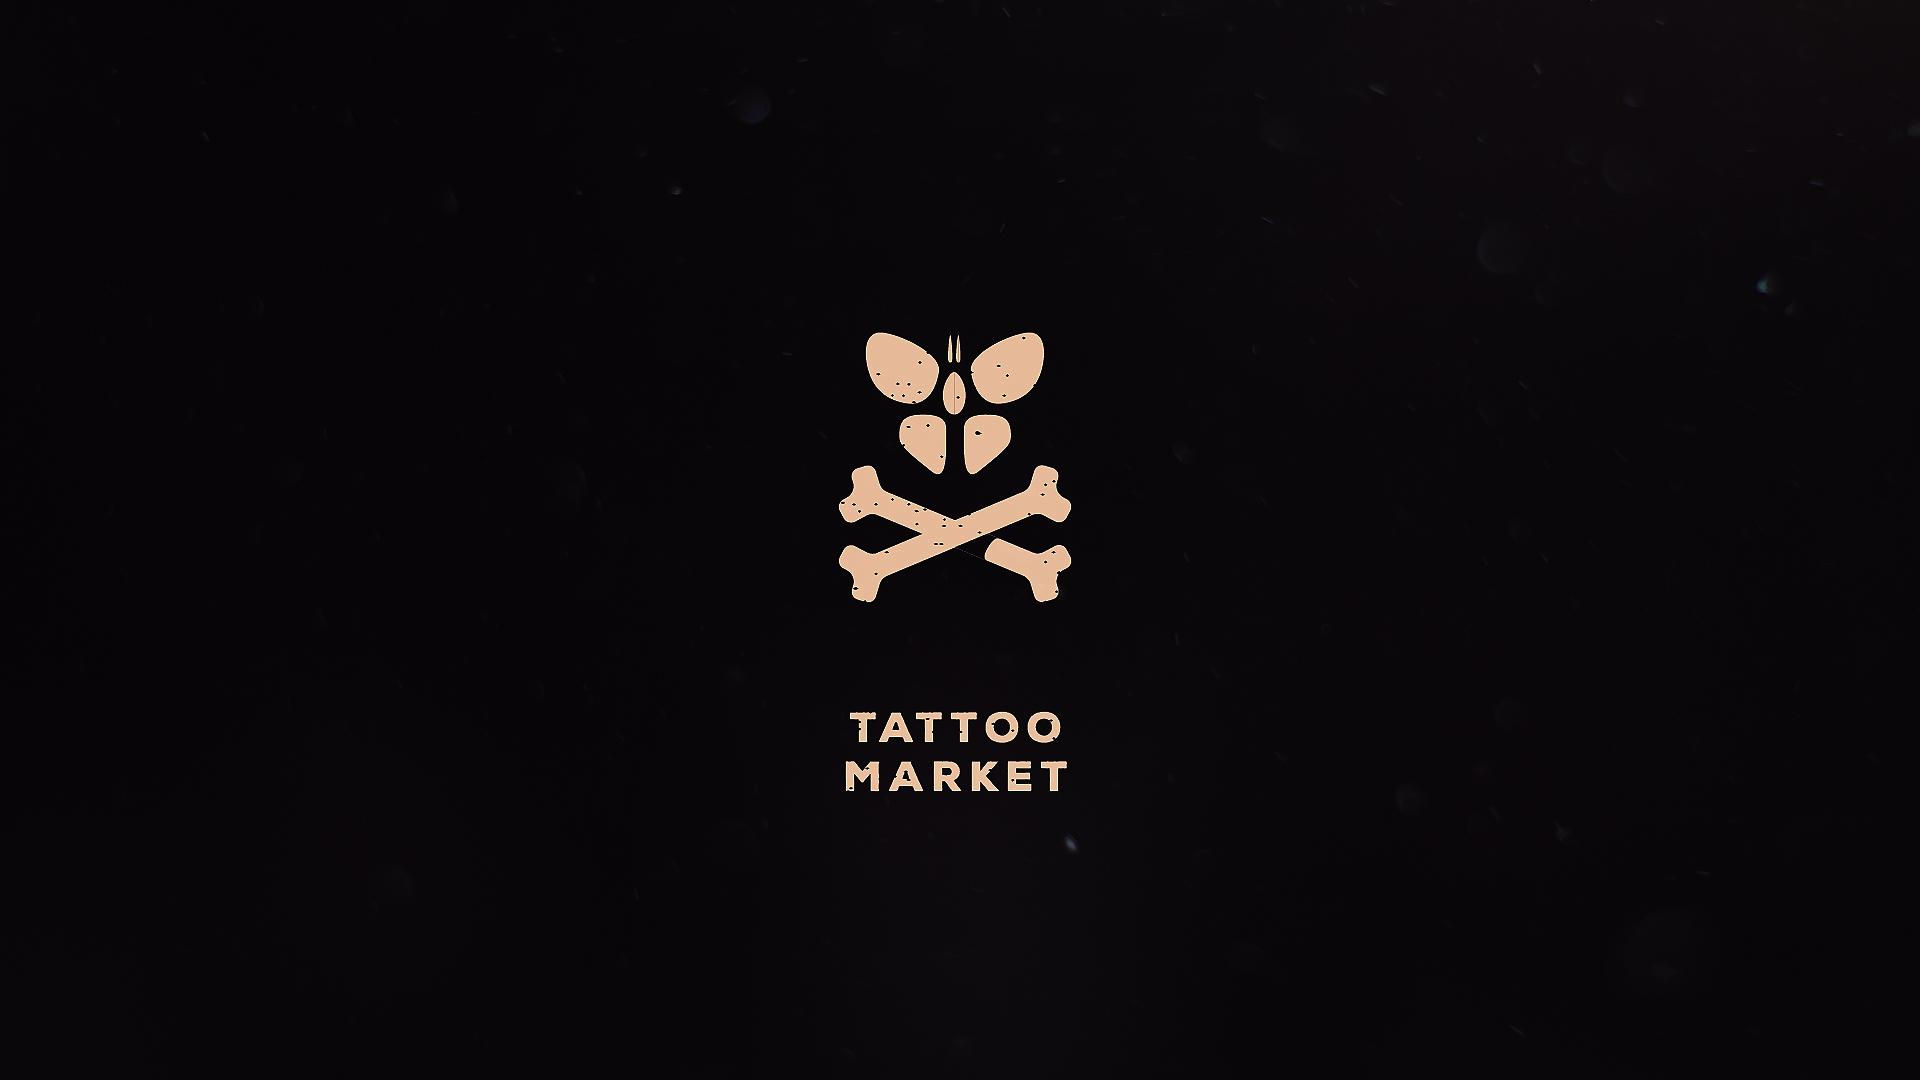 Редизайн логотипа магазина тату оборудования TattooMarket.ru фото f_4445c5195f8ab9eb.jpg